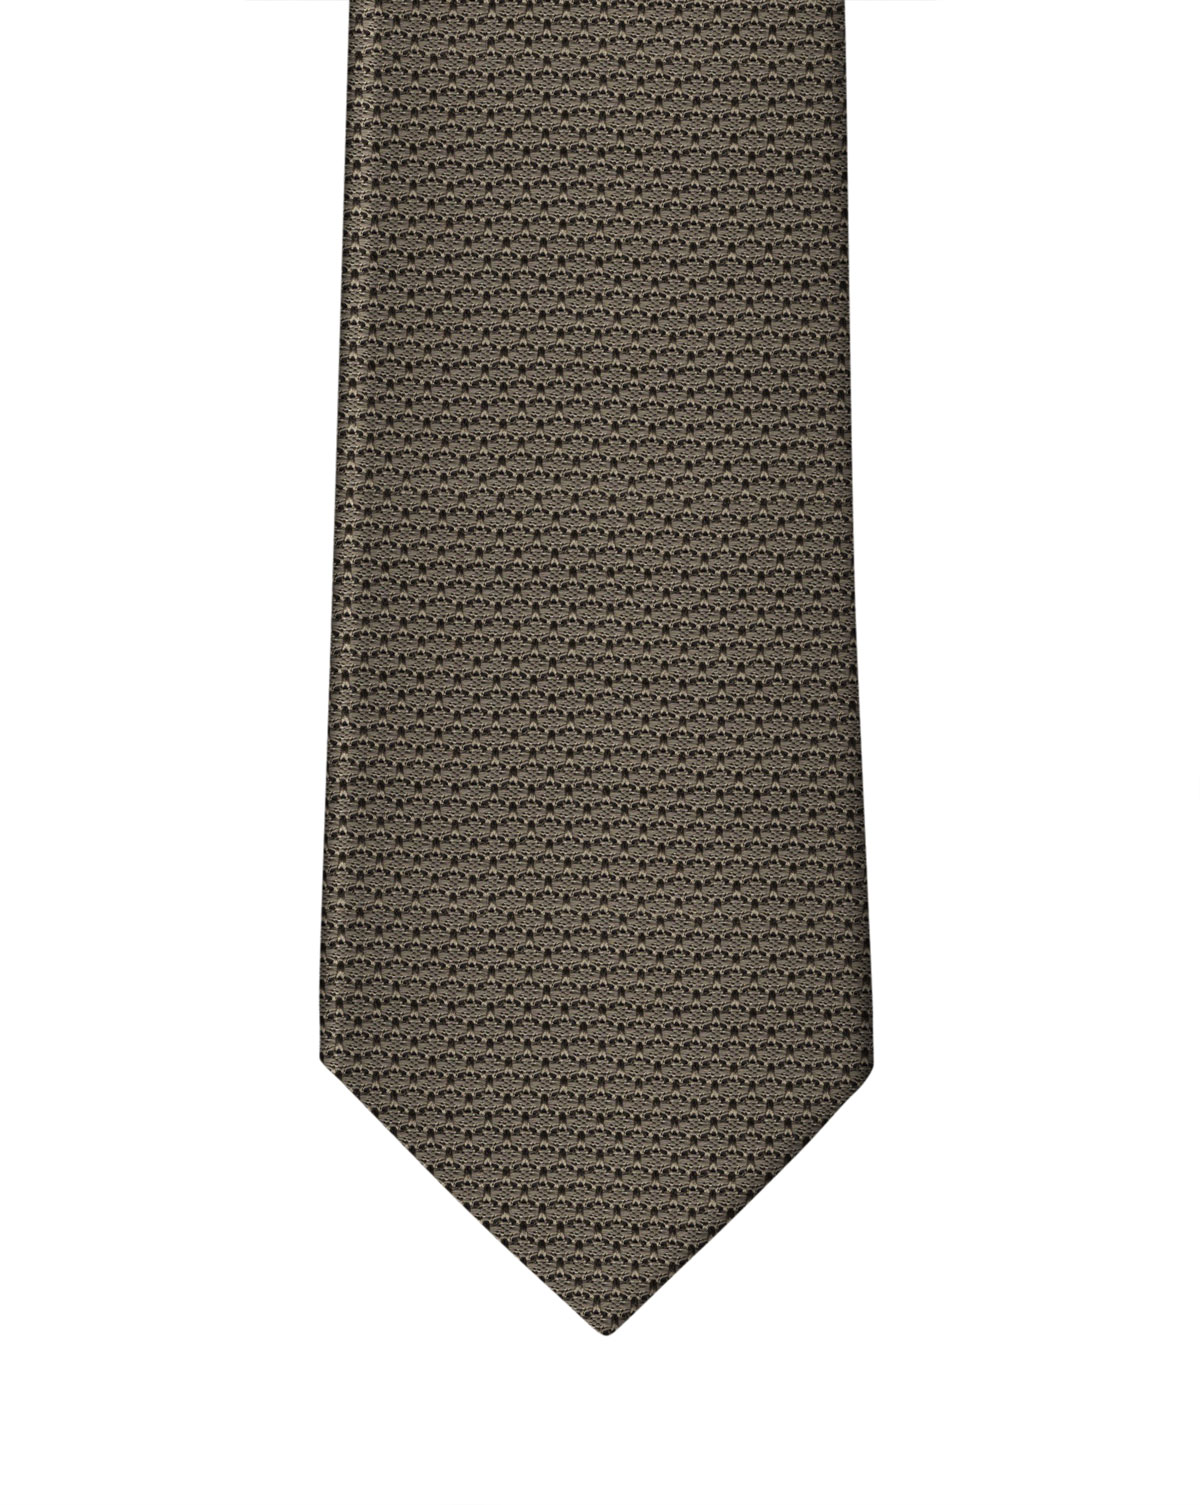 Moss Green Grenadine Necktie